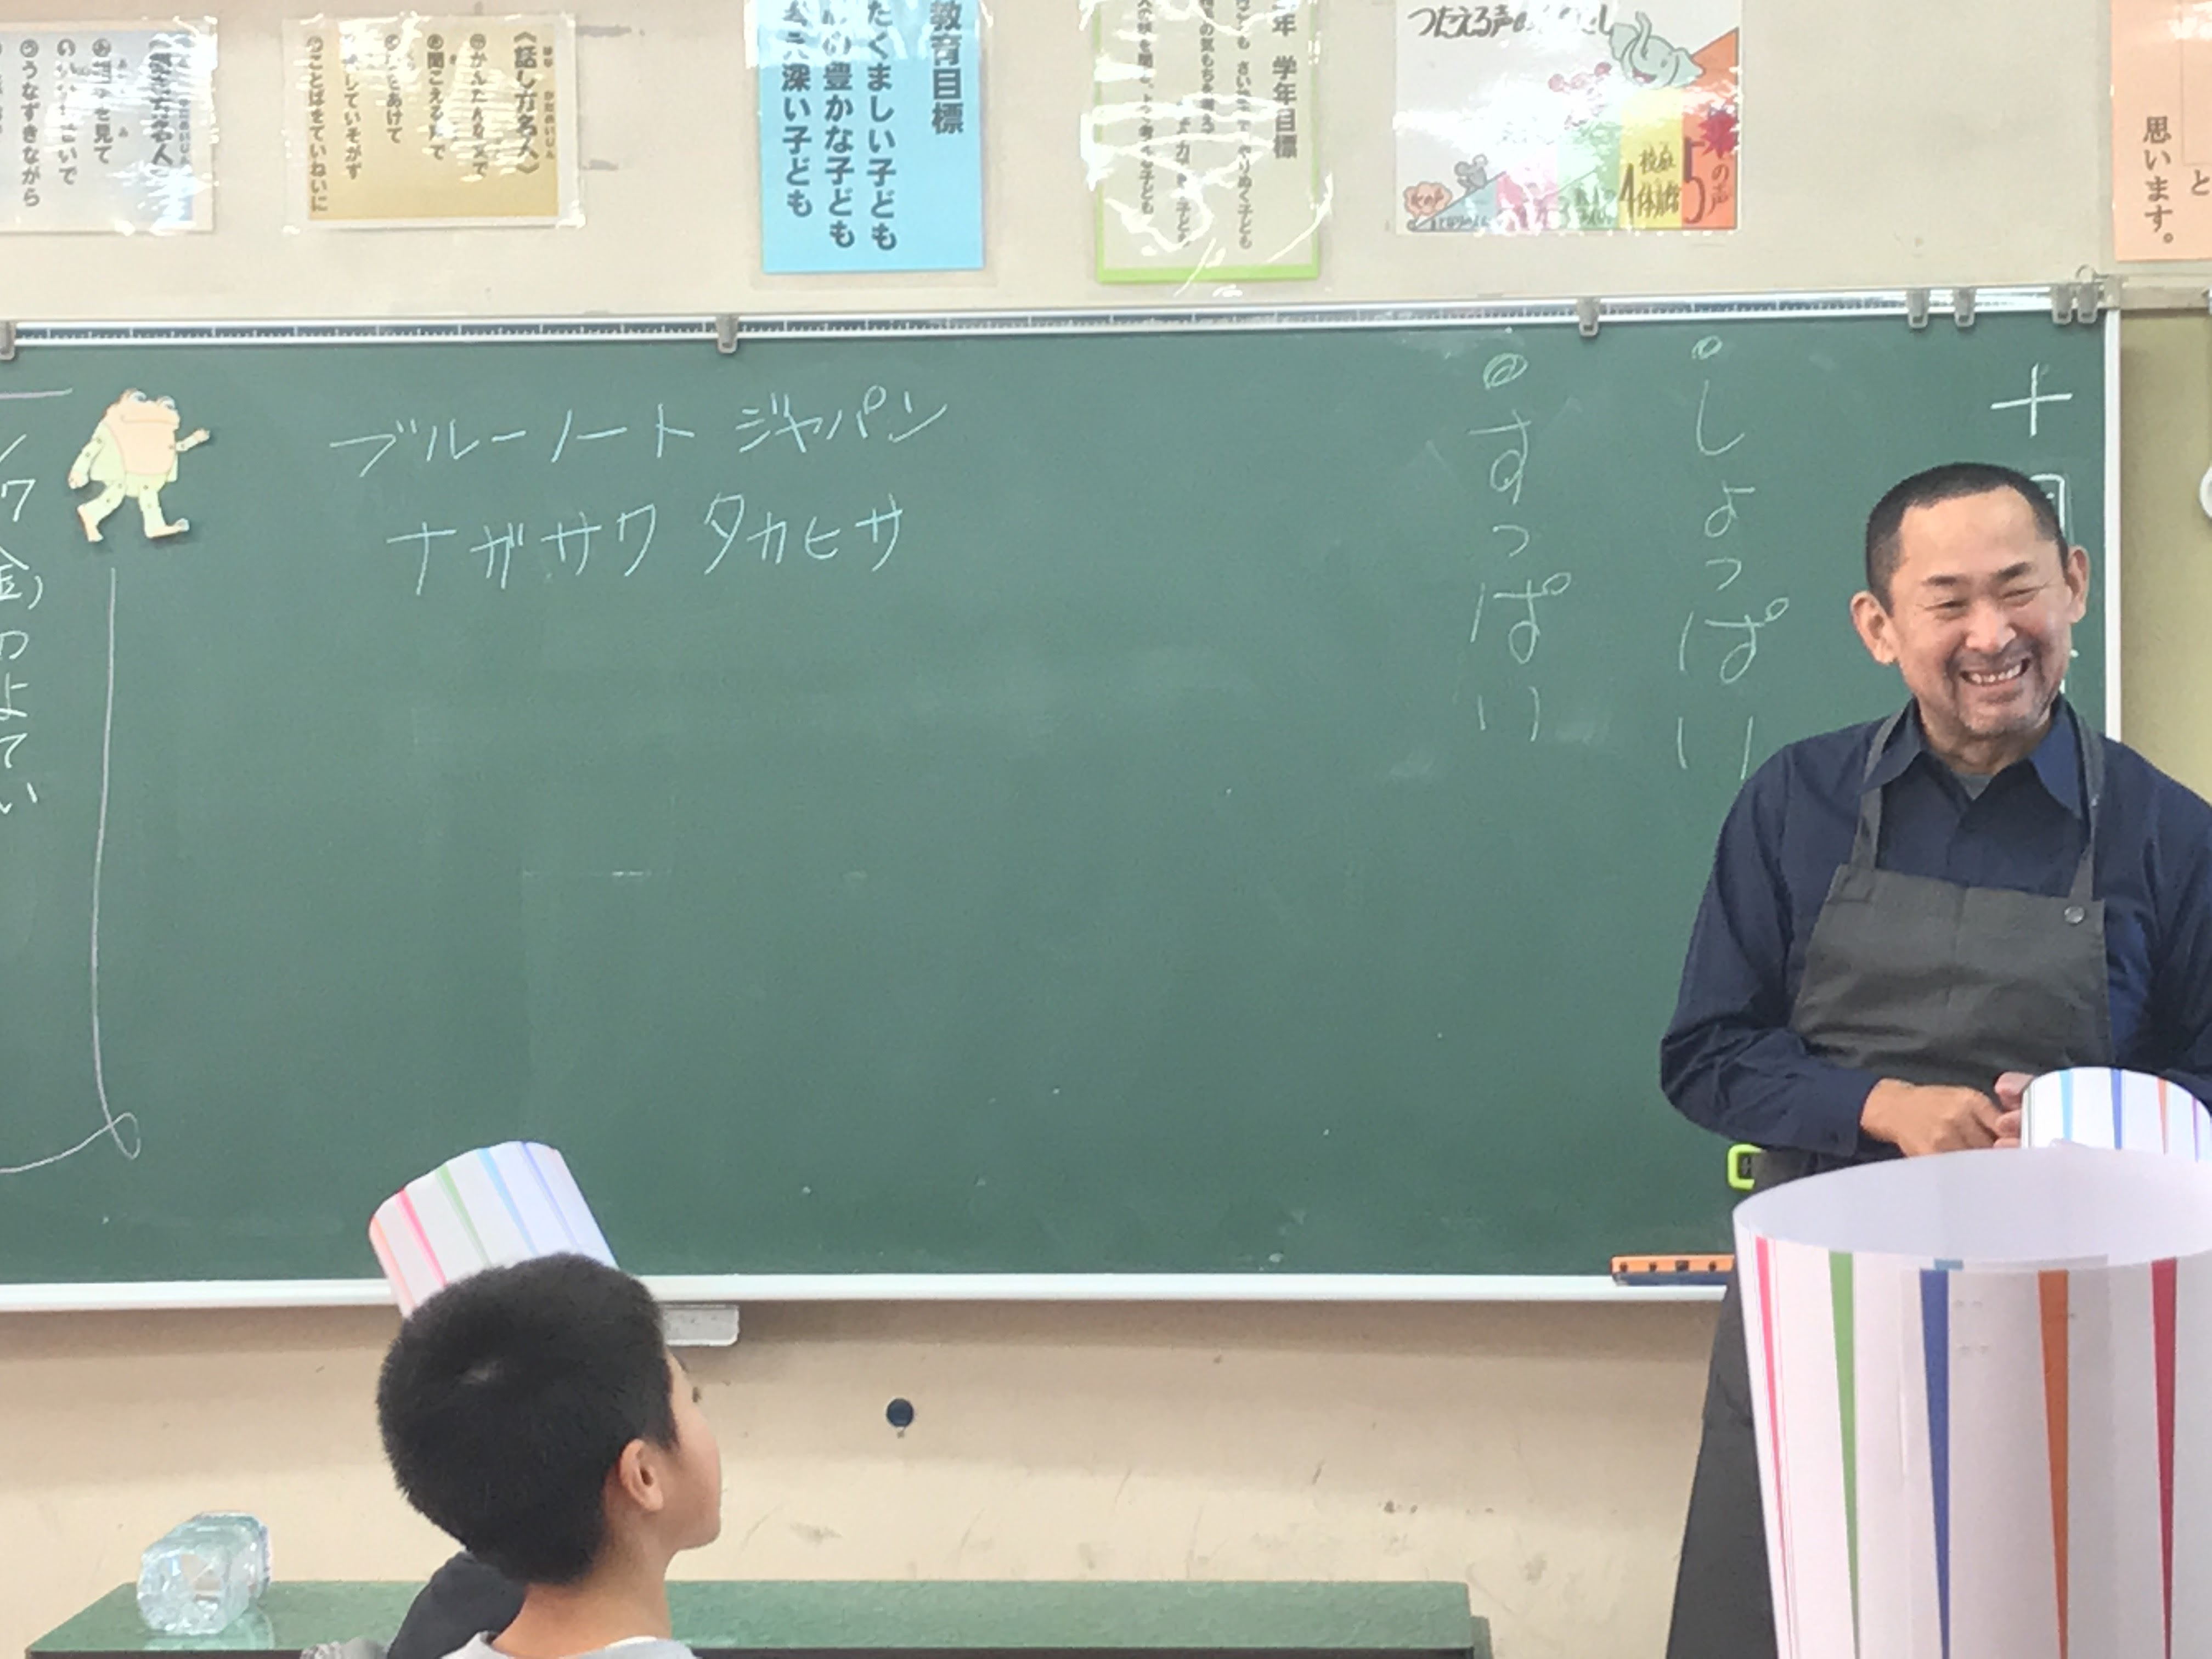 『味覚の一週間』当社総料理長が小学校を訪問